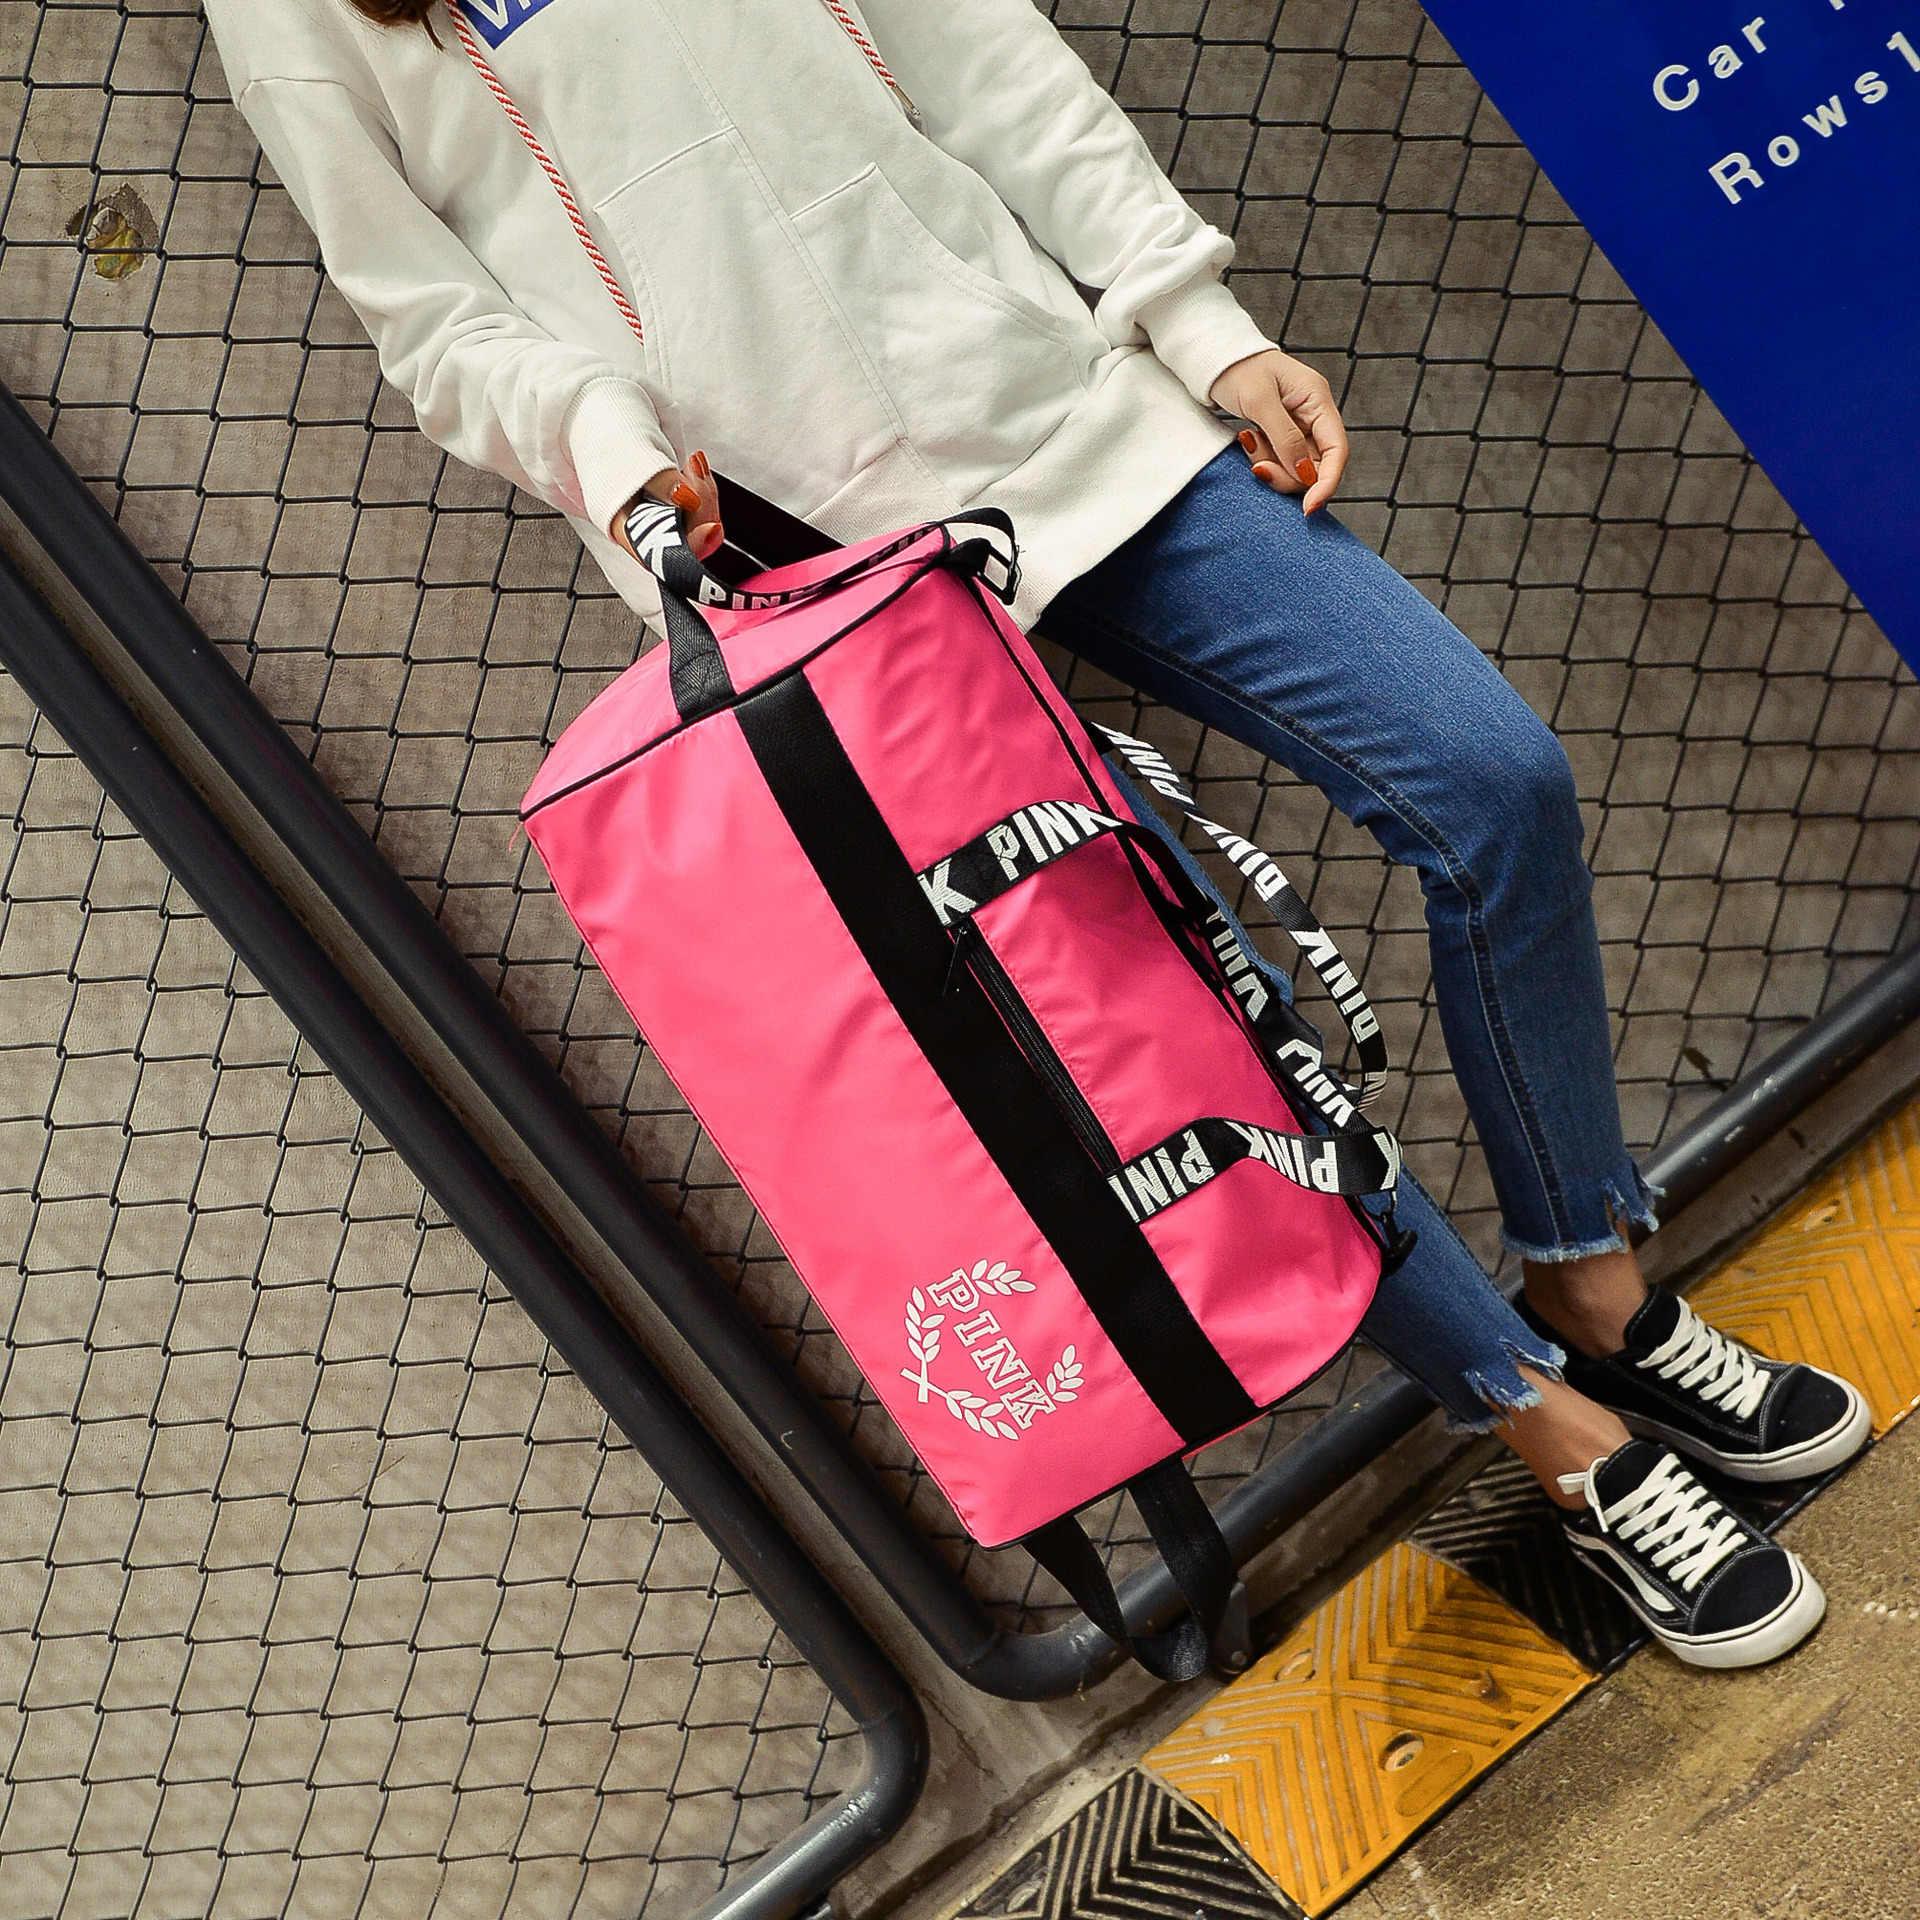 35fe8d24b426 ... 2018Waterproof Shoulder Sport Gym Bag for Shoes Storage Women Fitness  Yoga Training Bags Men s Gymnastic Handbag ...